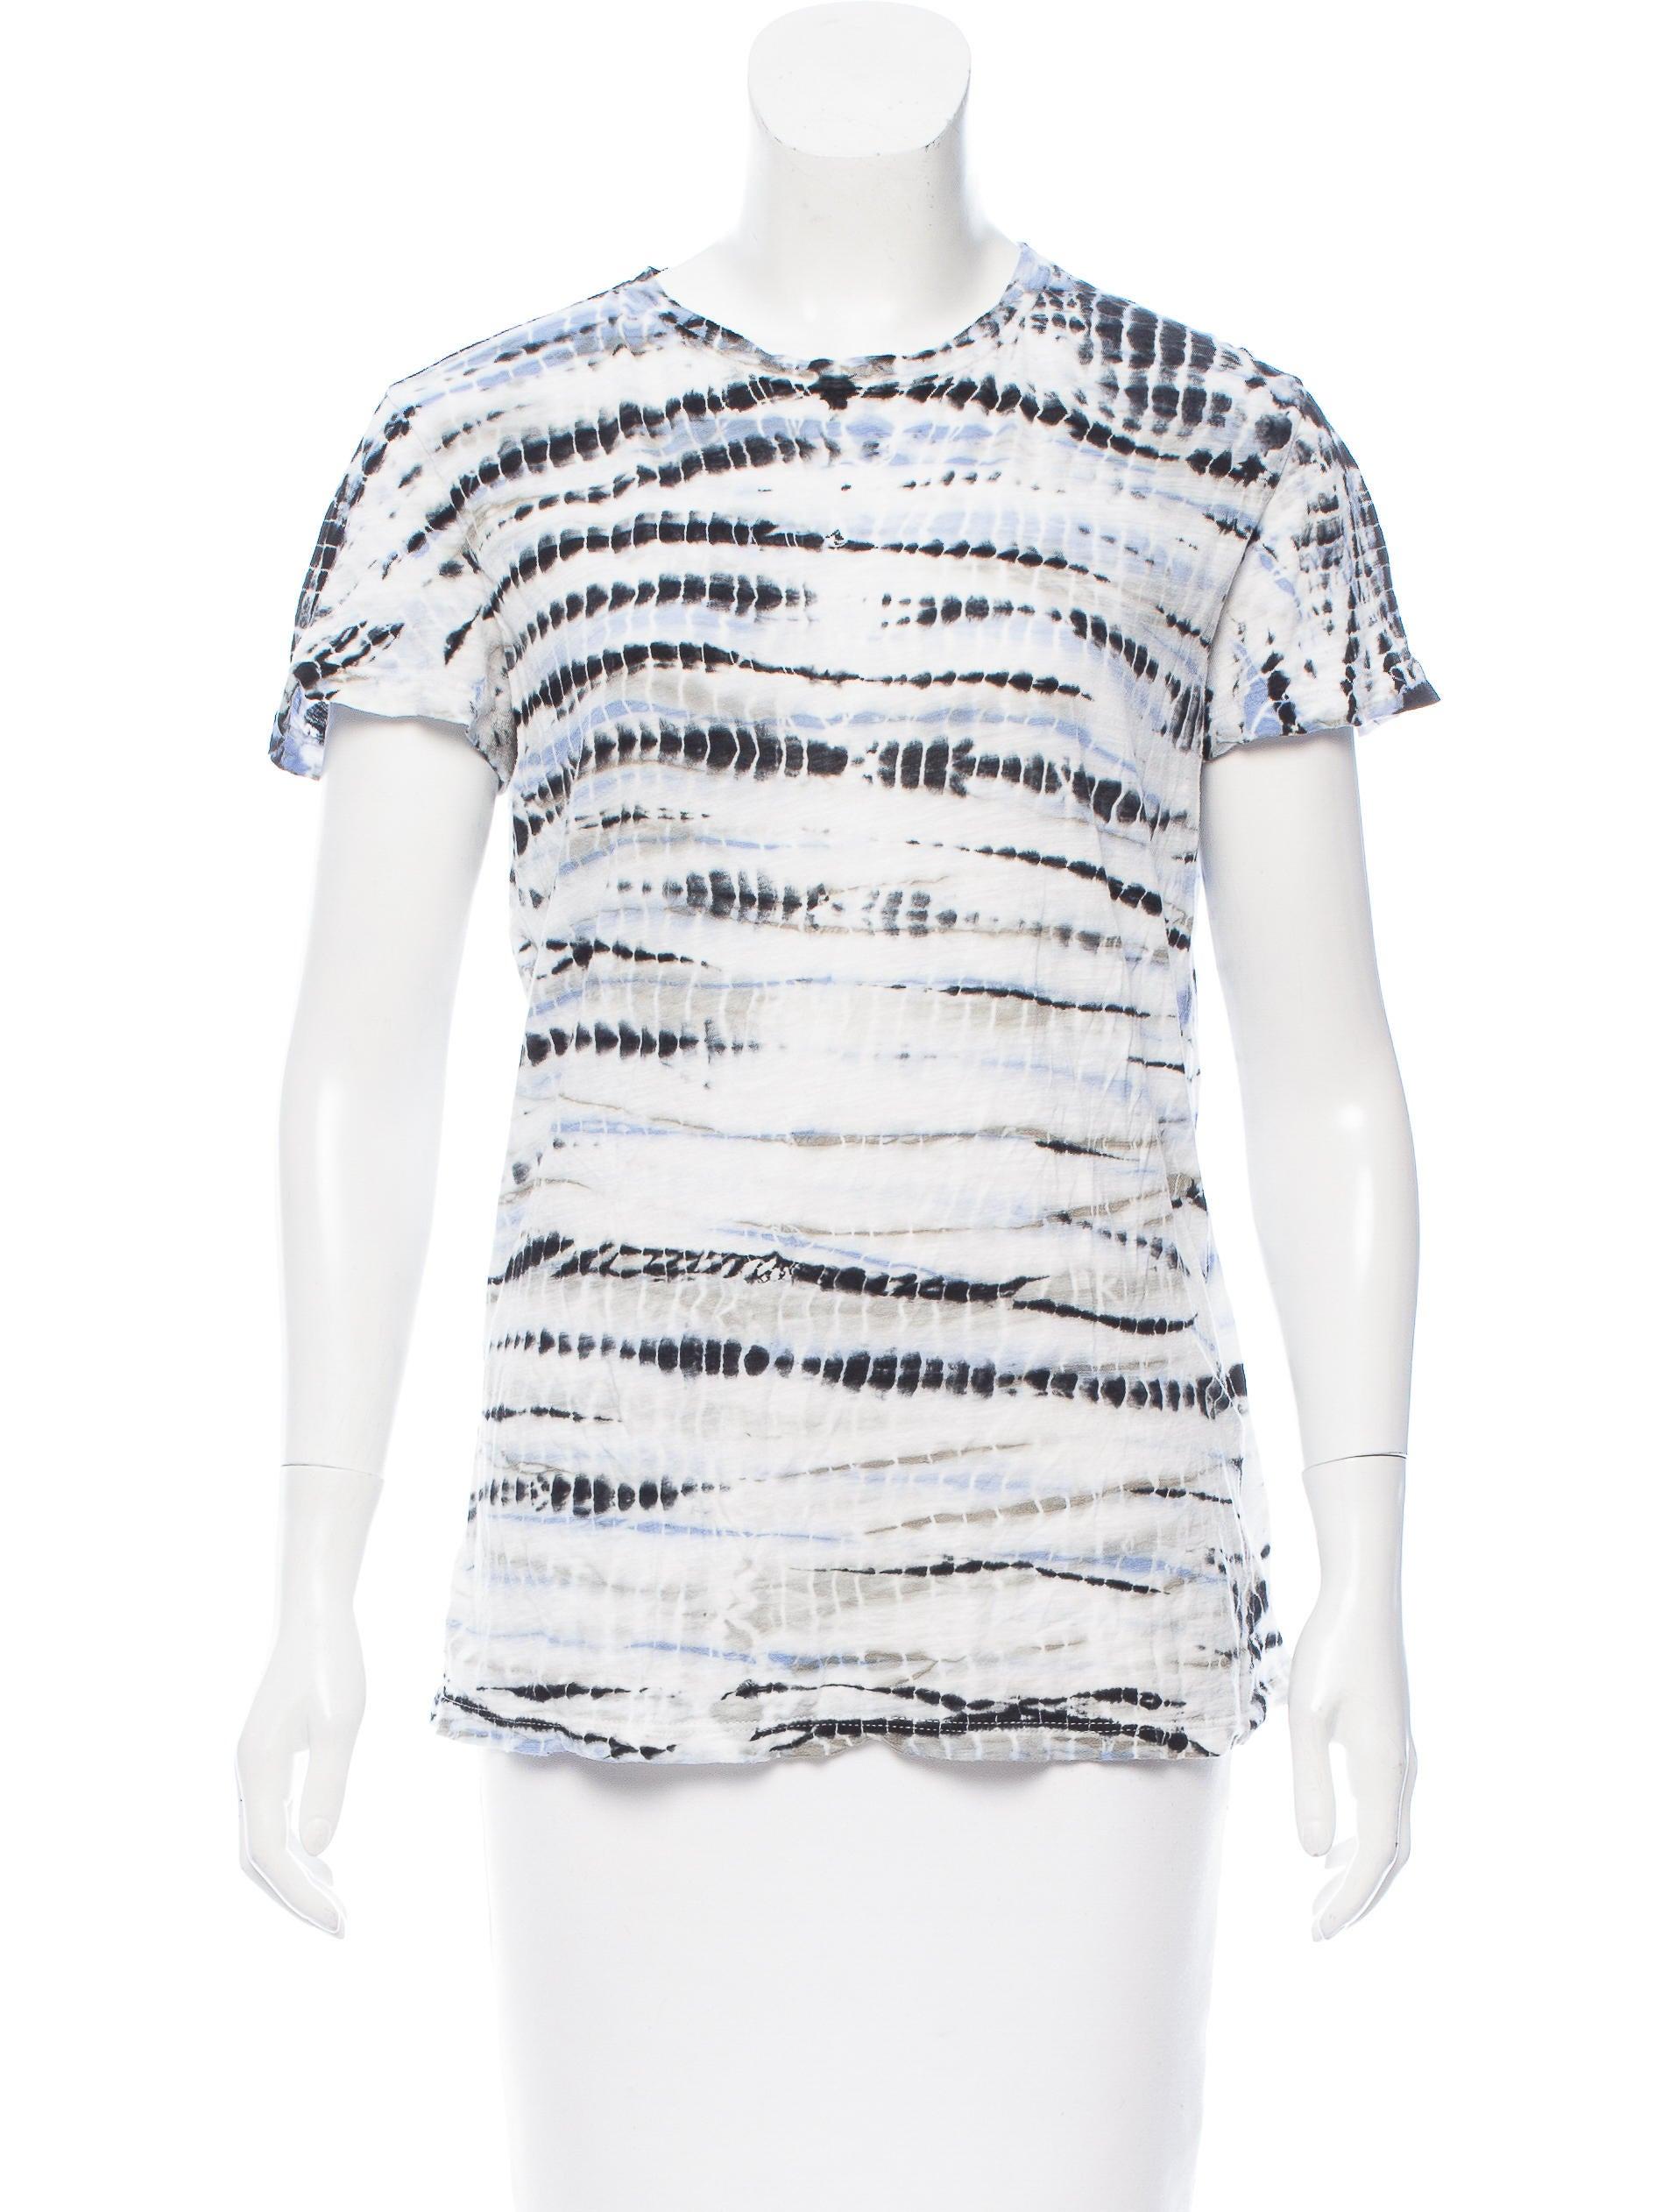 Proenza schouler tie dye printed knit t shirt clothing for Tie dye printed shirts